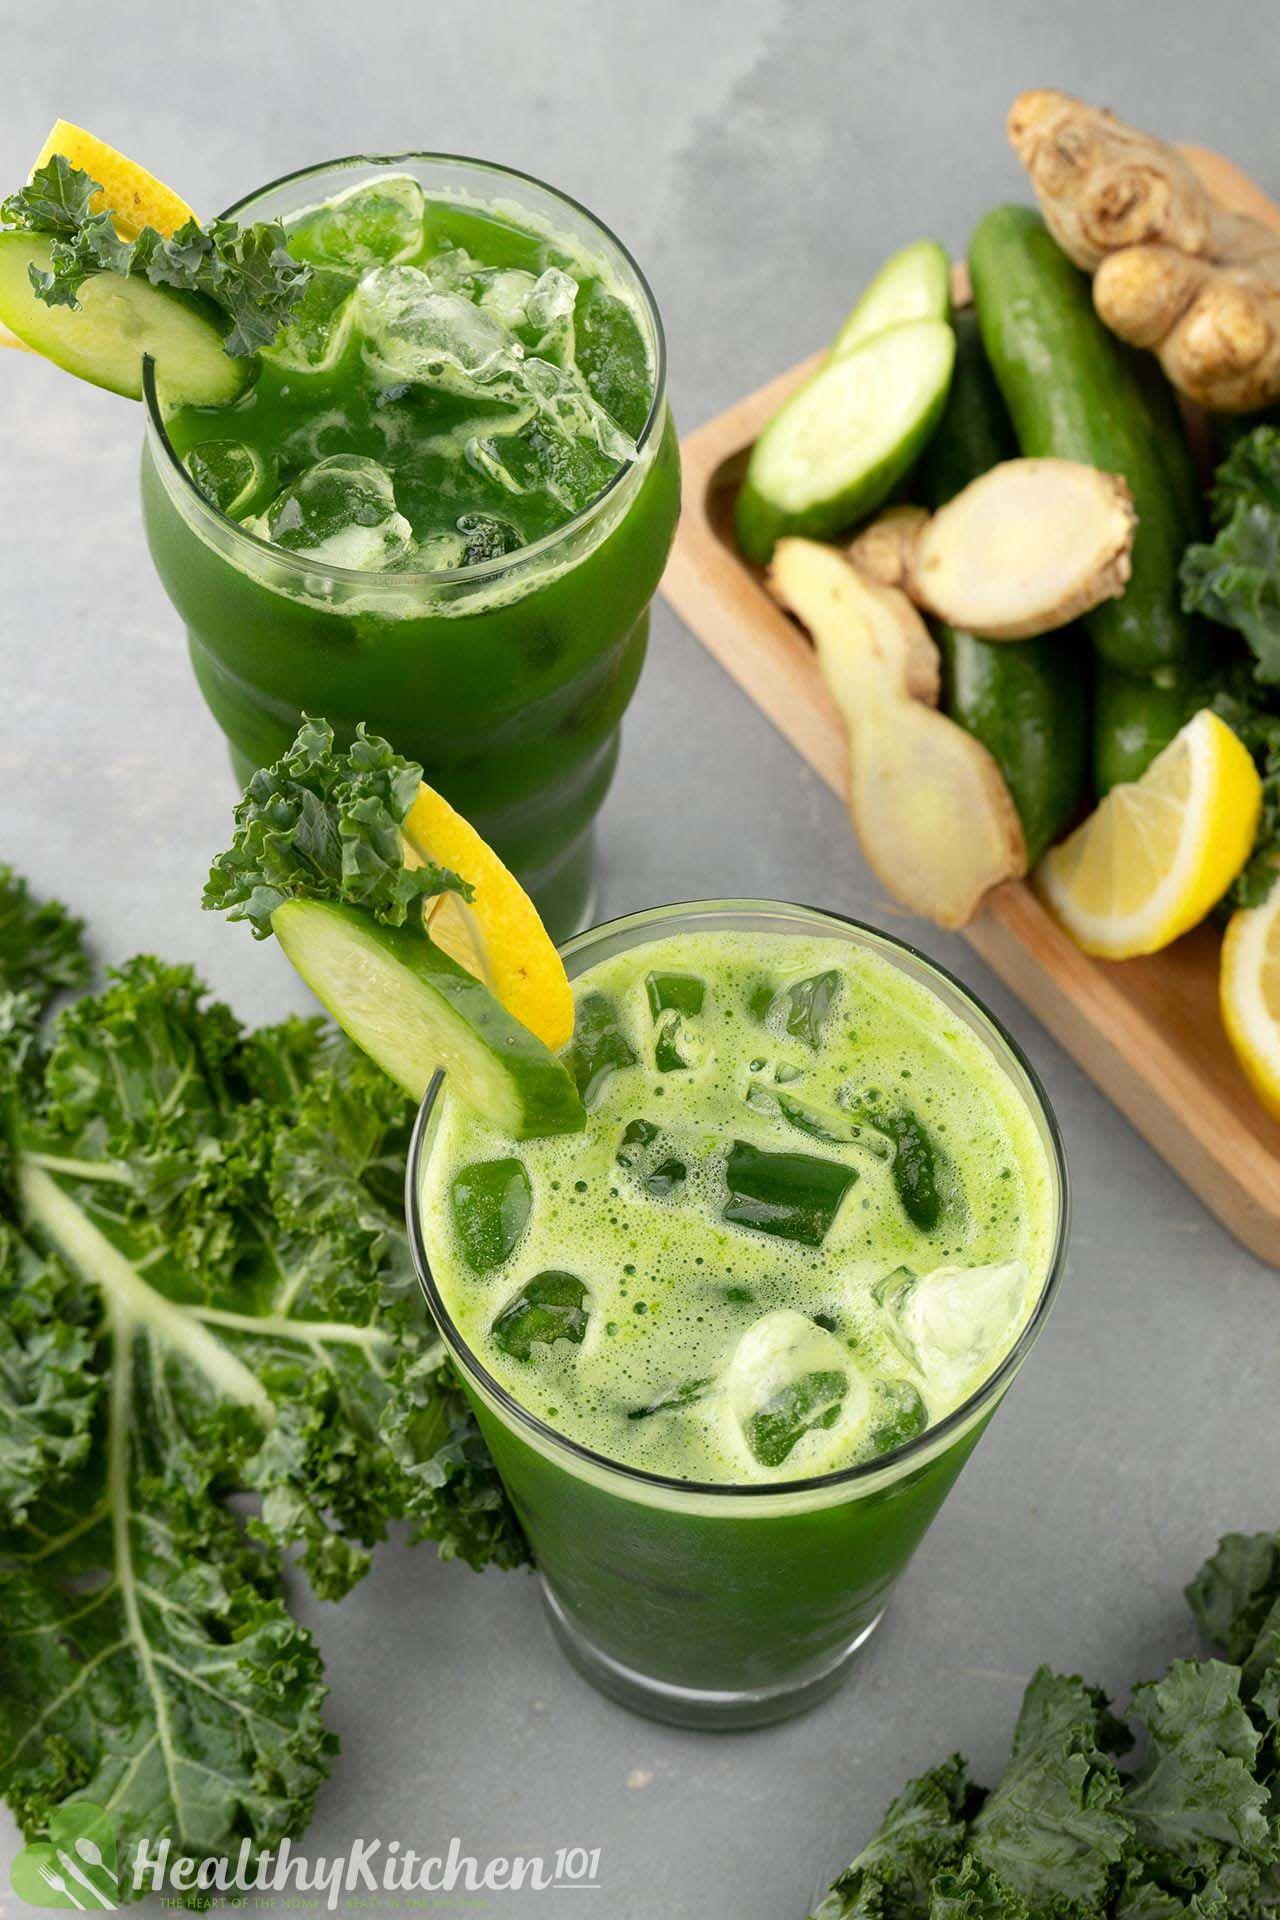 benefits of this juice